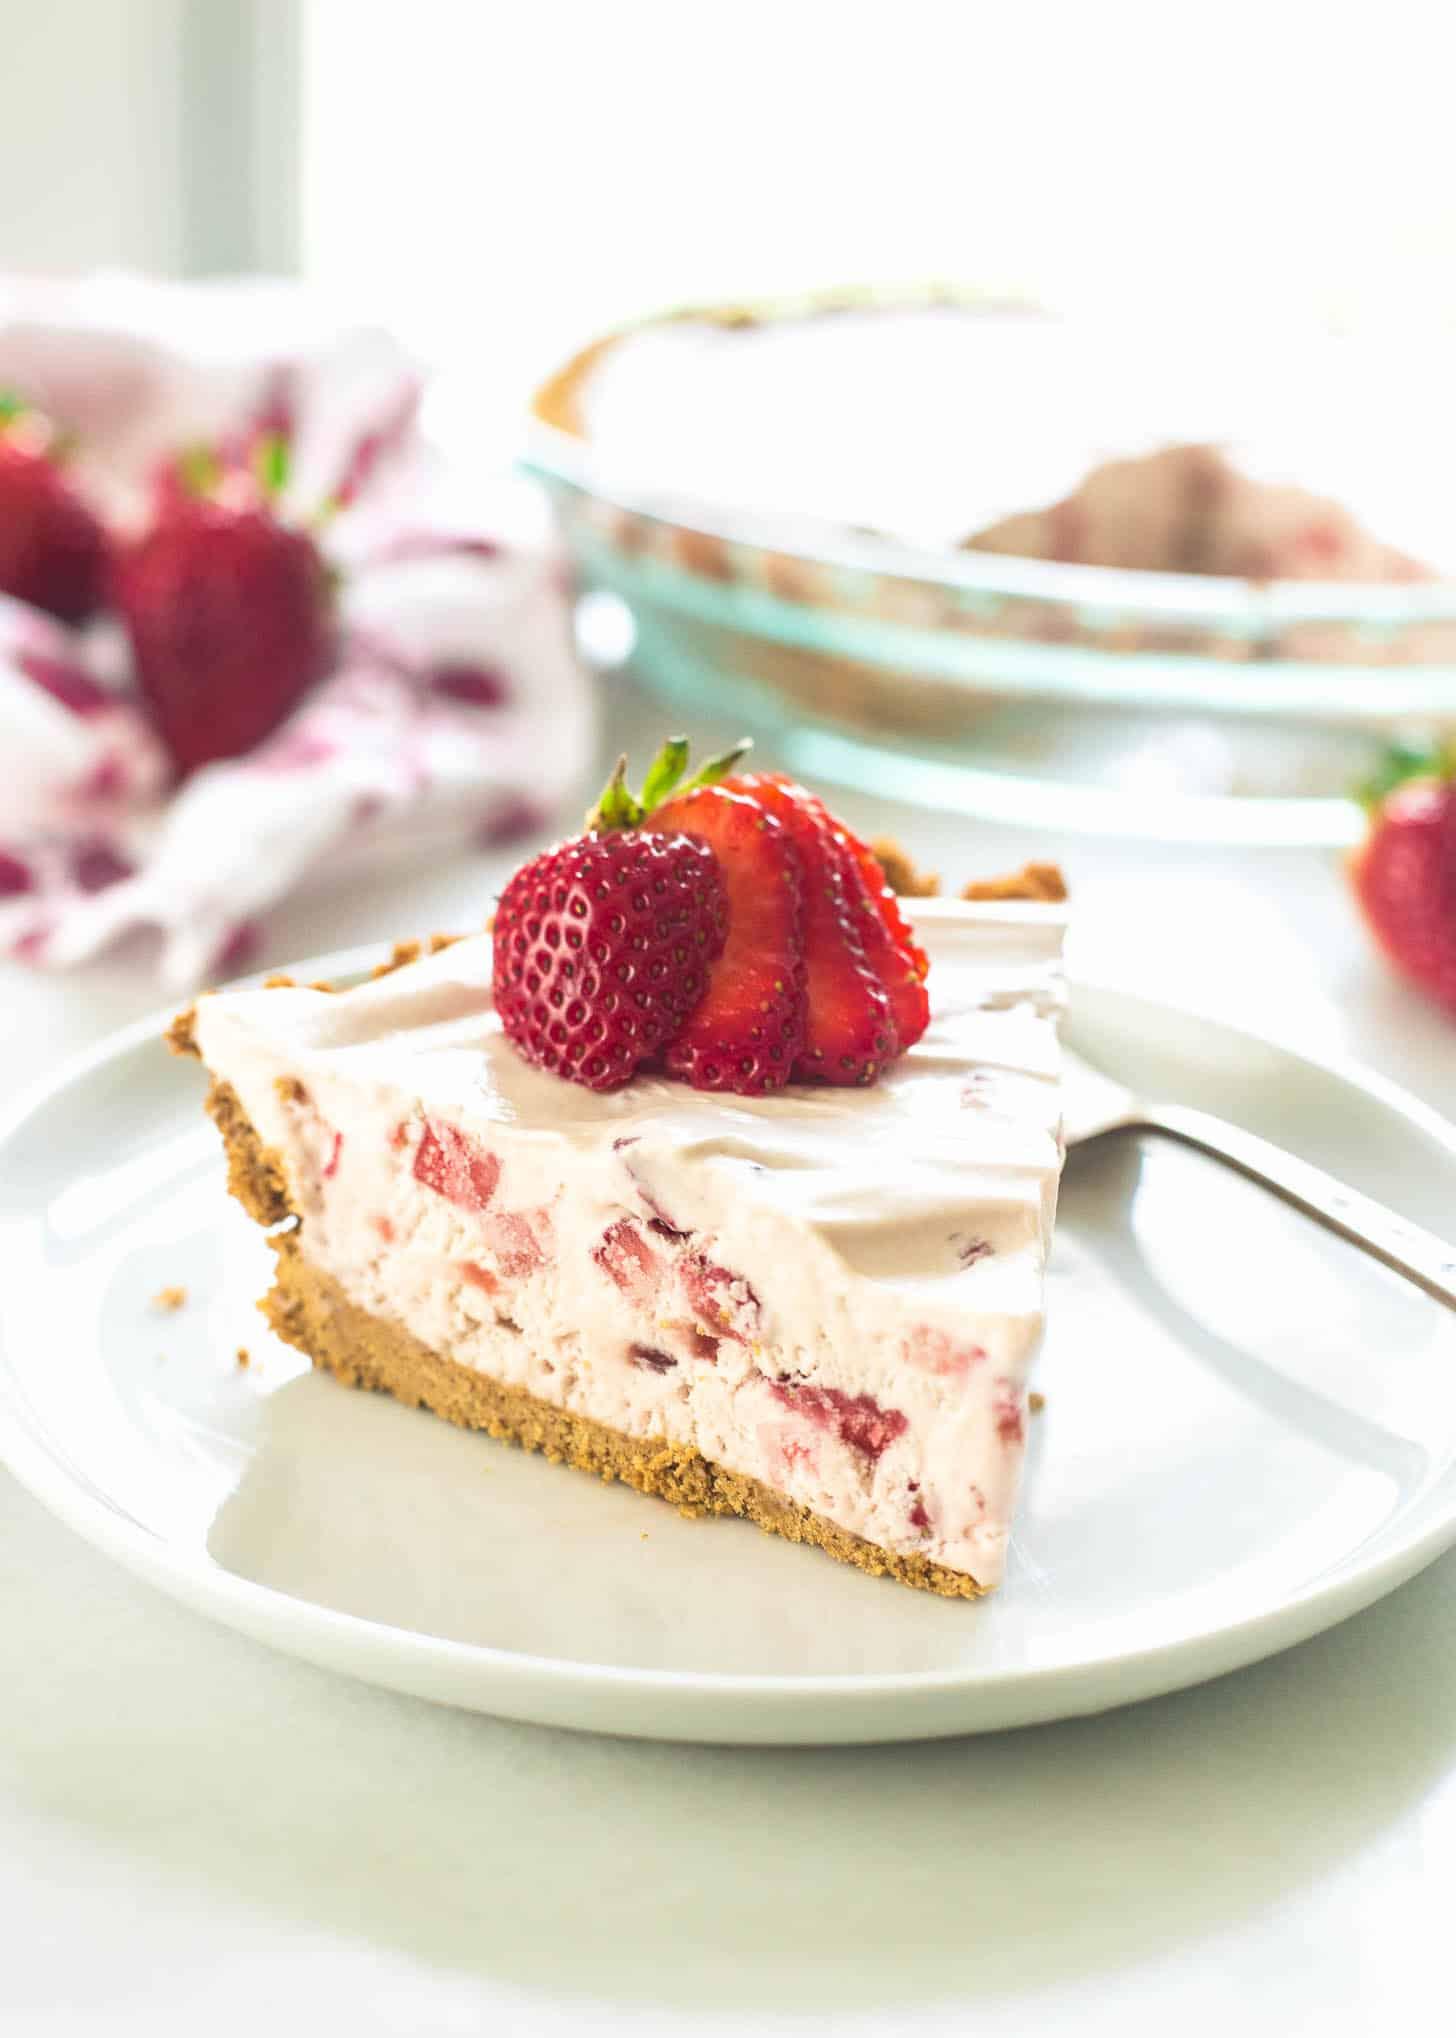 How to make strawberry cream pie